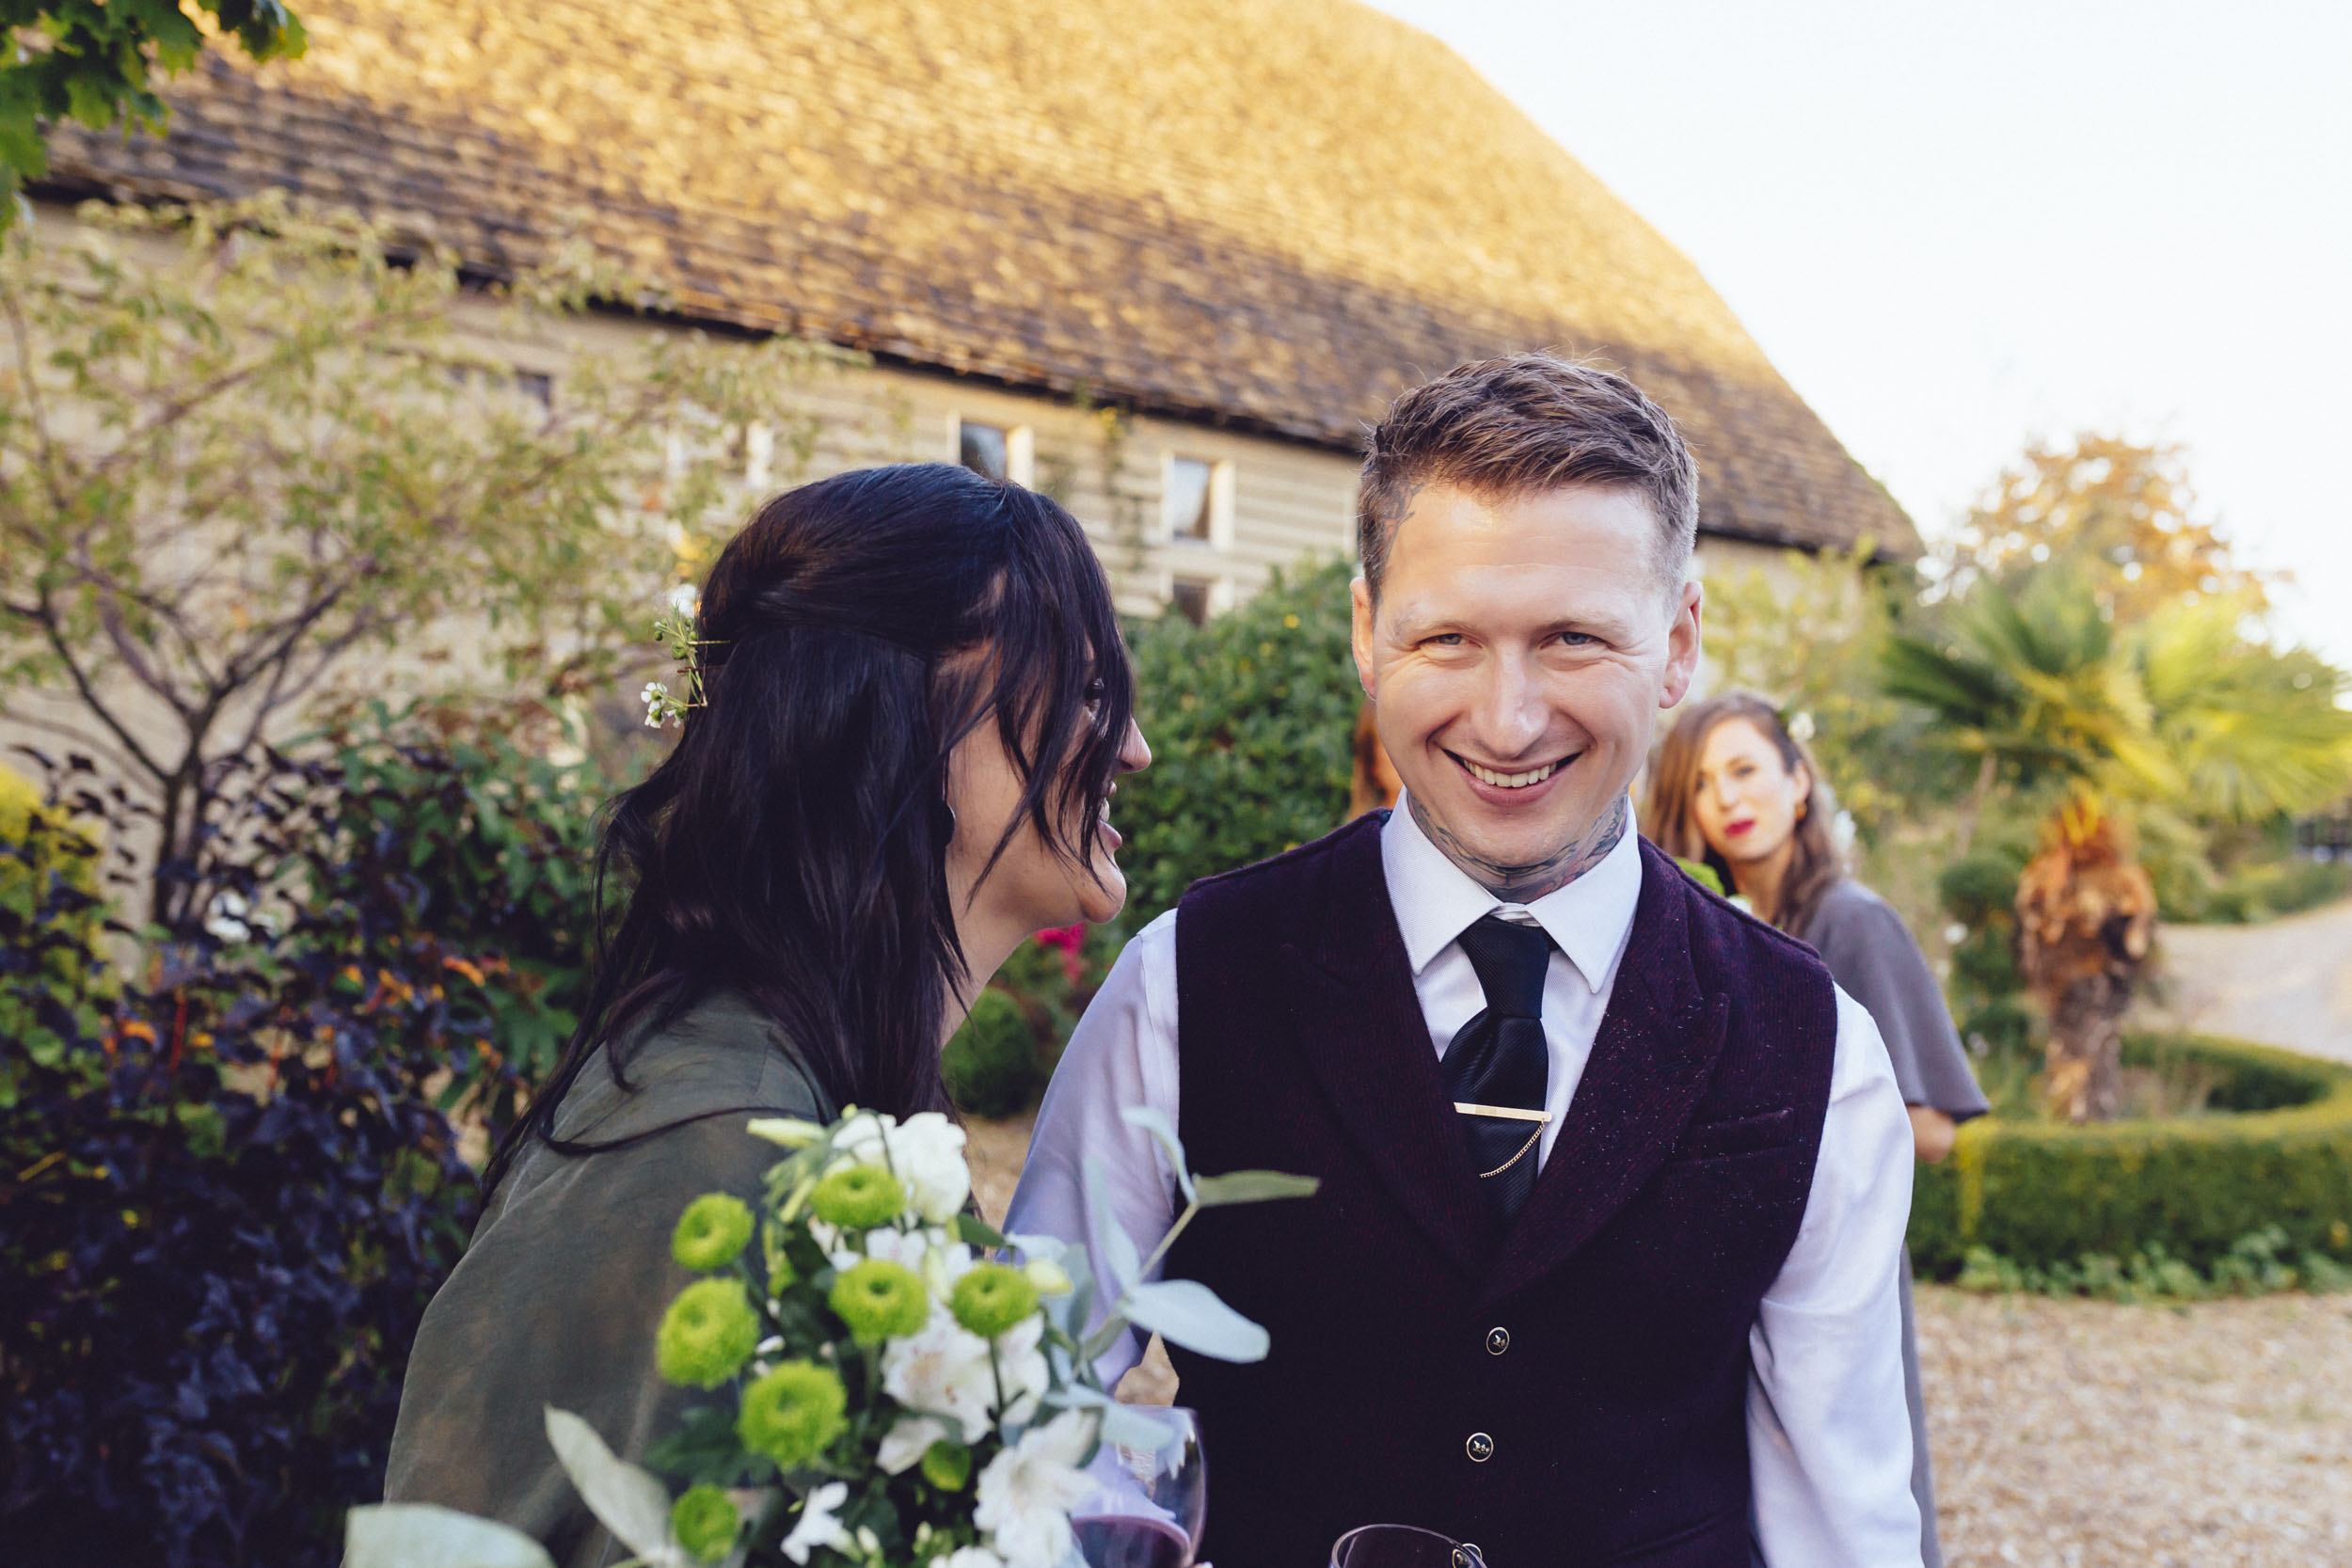 Brockworth court barn-unconventional fun wedding photography068.jpg